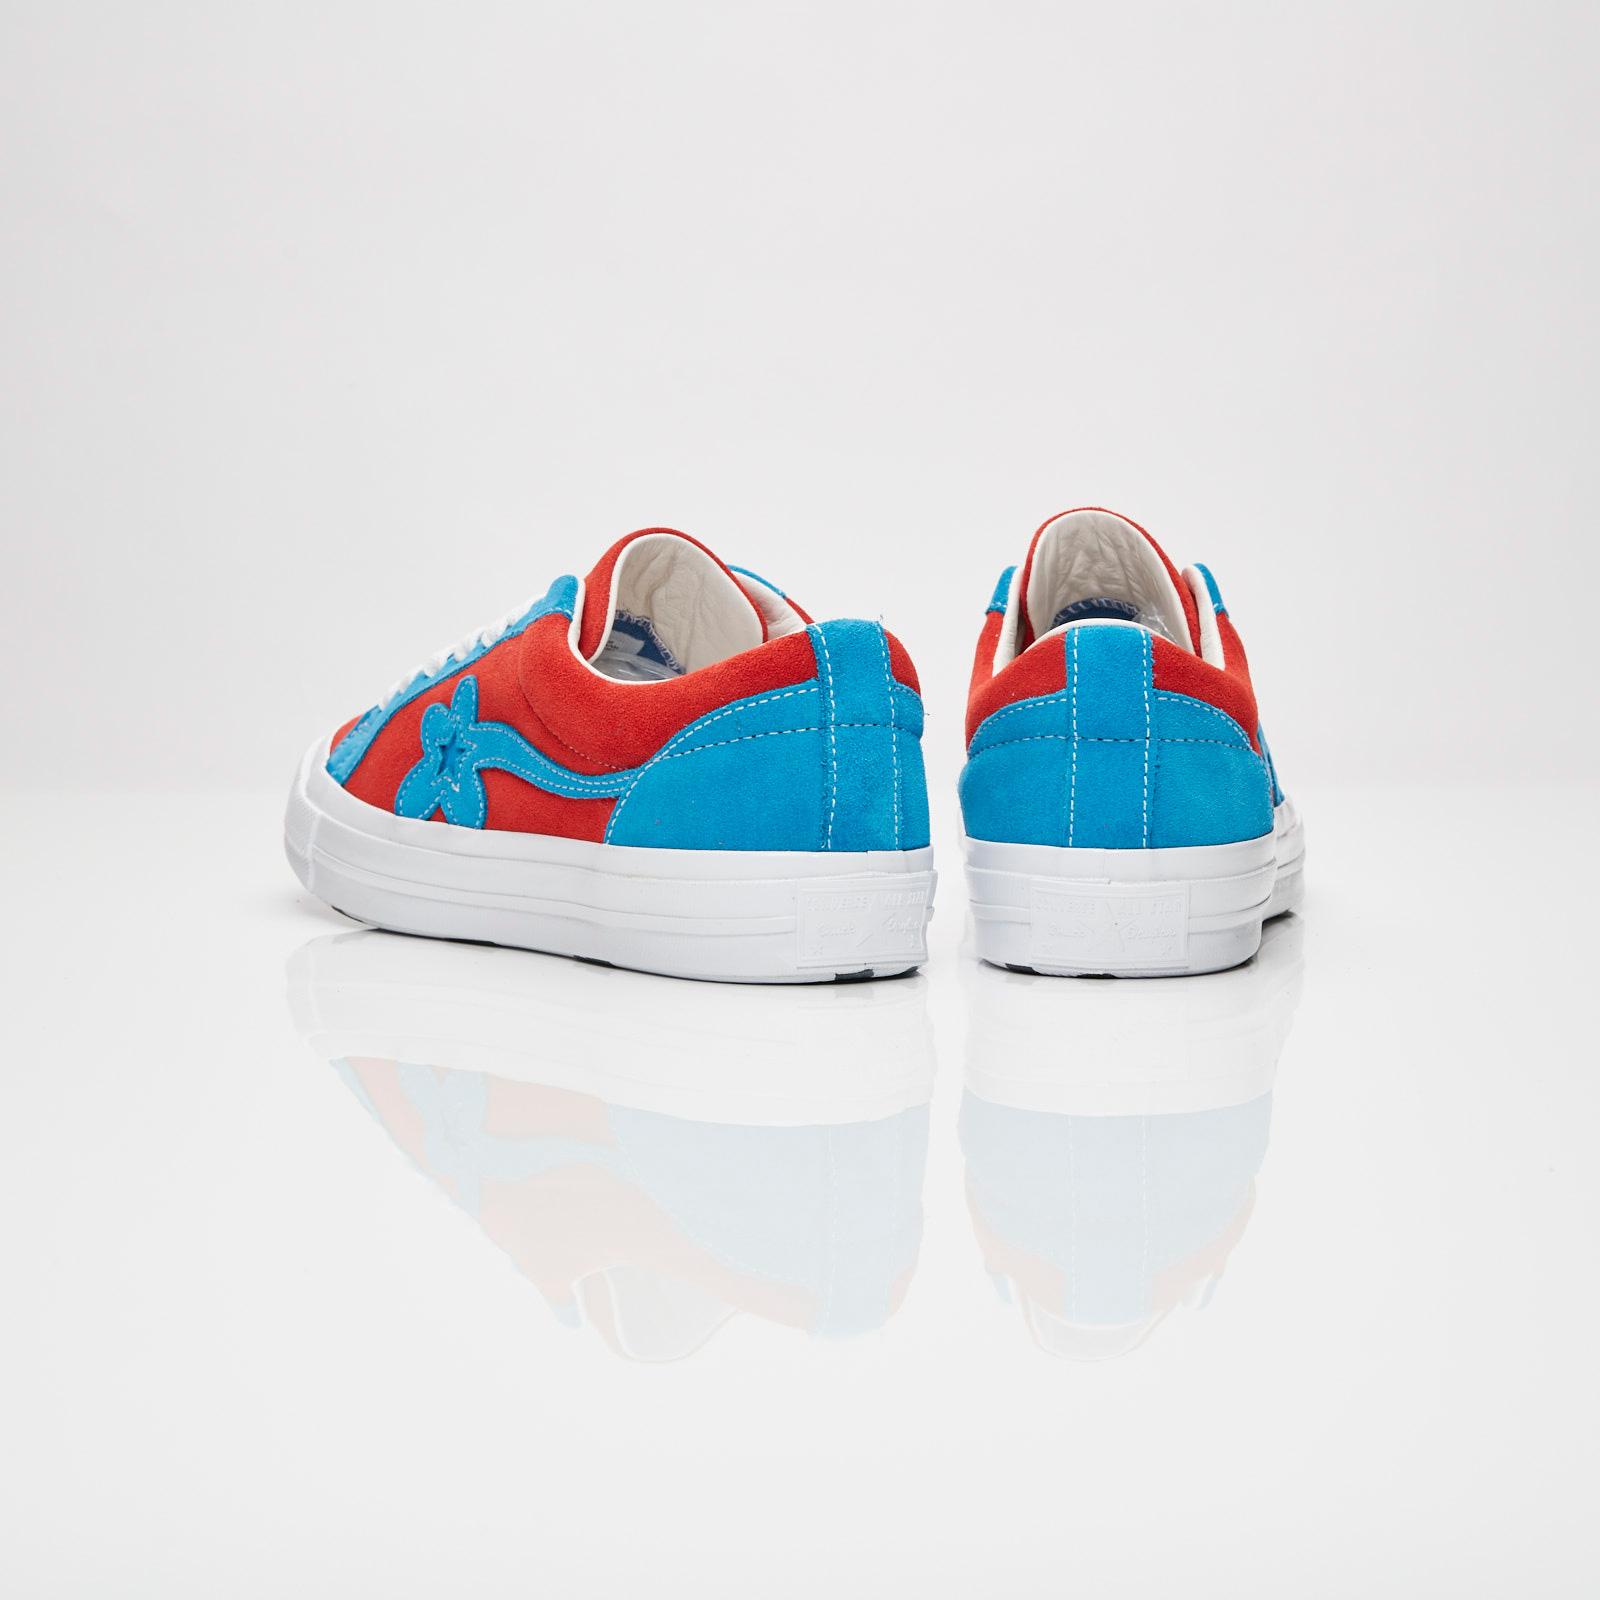 Converse One Star X Golf Le Fleur 162126c Sneakersnstuff